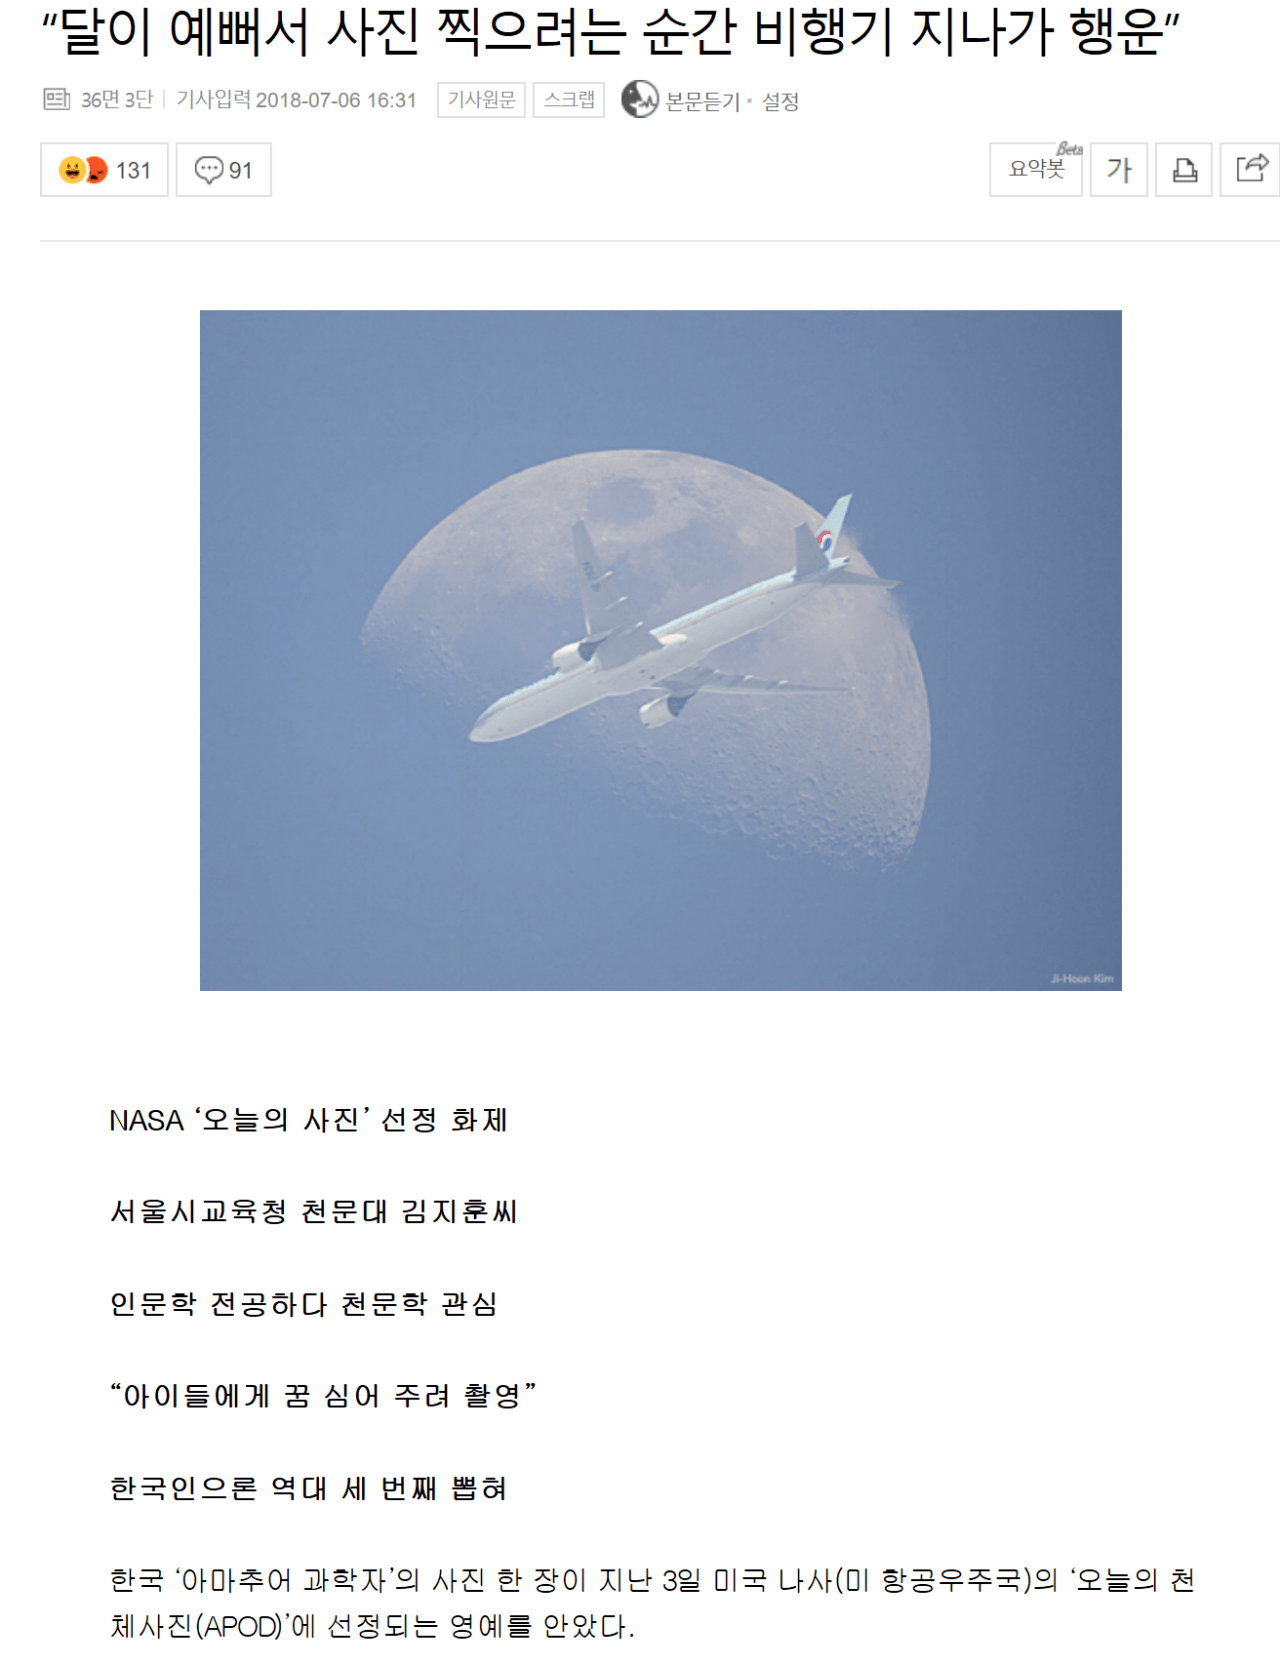 NASA 오늘의 사진 선정